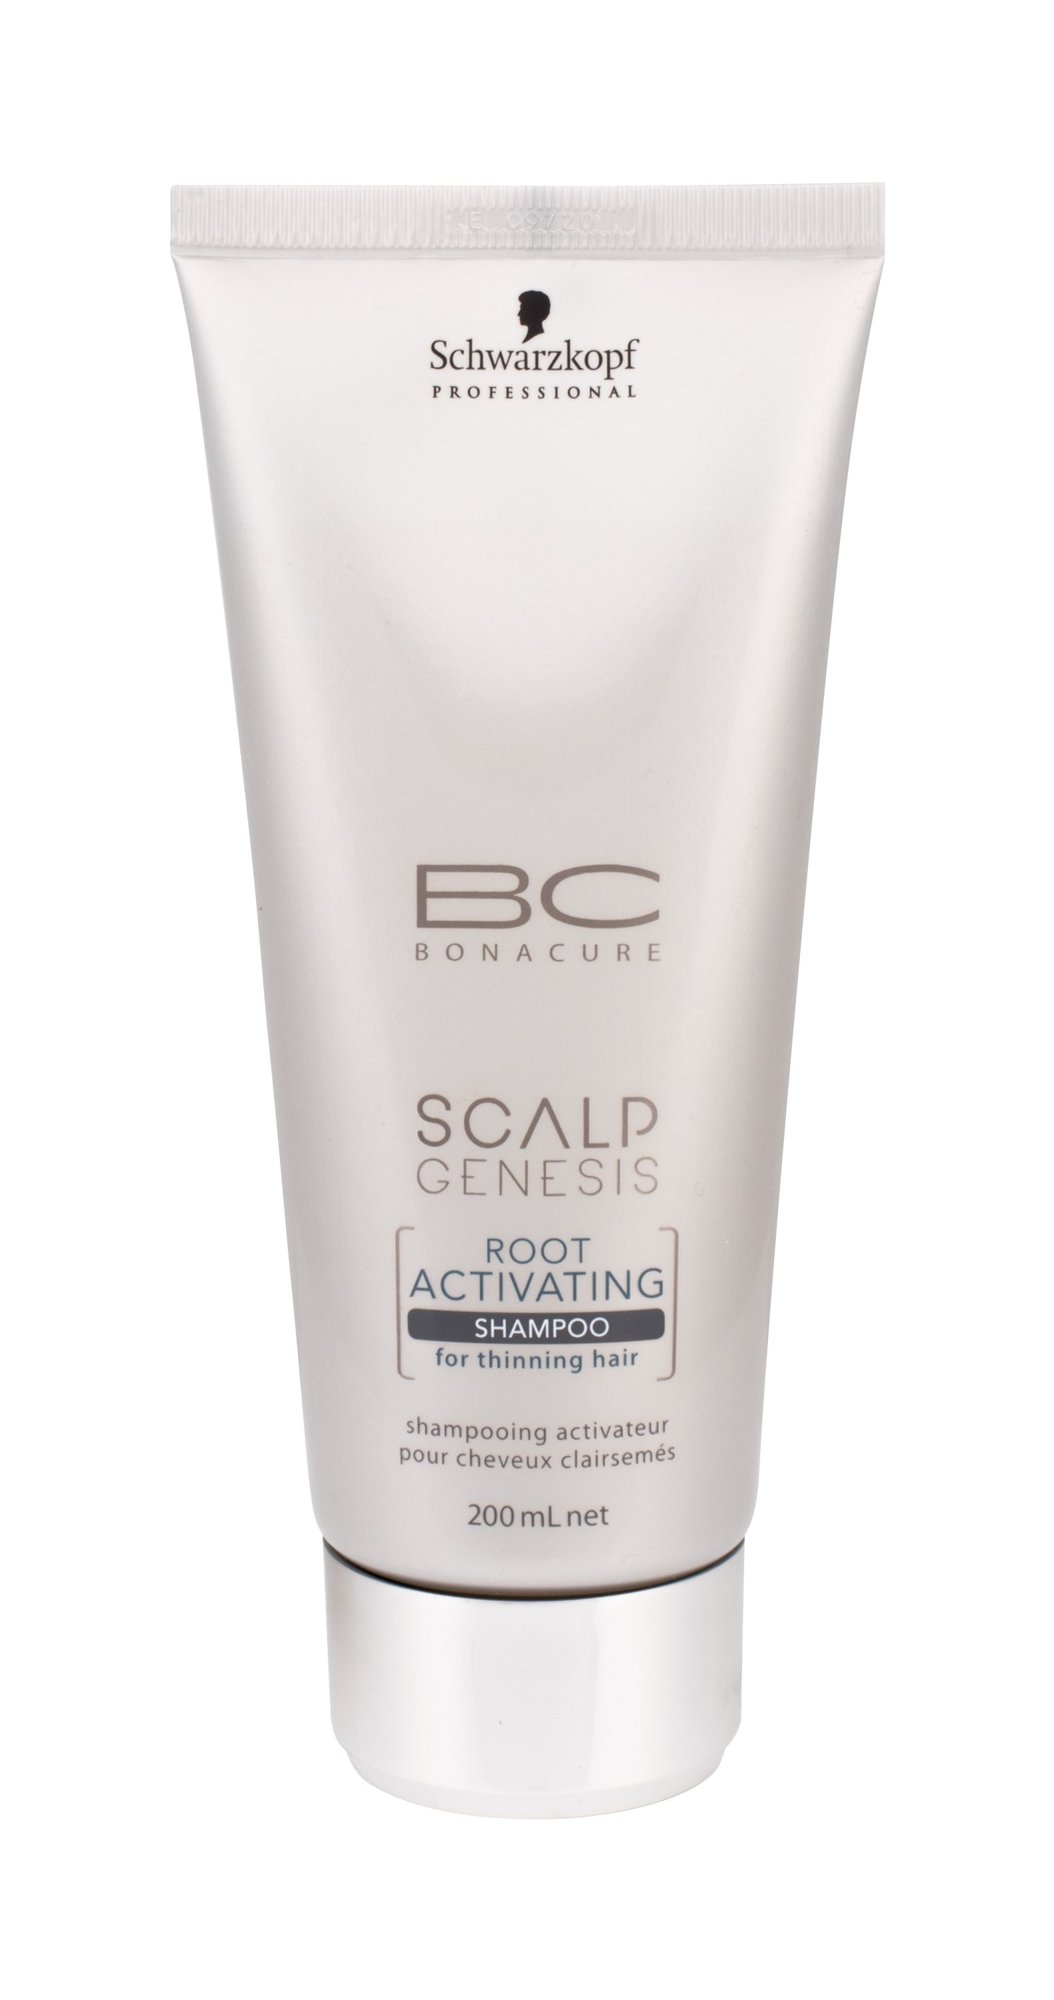 Schwarzkopf Professional BC Bonacure Scalp Genesis Cosmetic 200ml